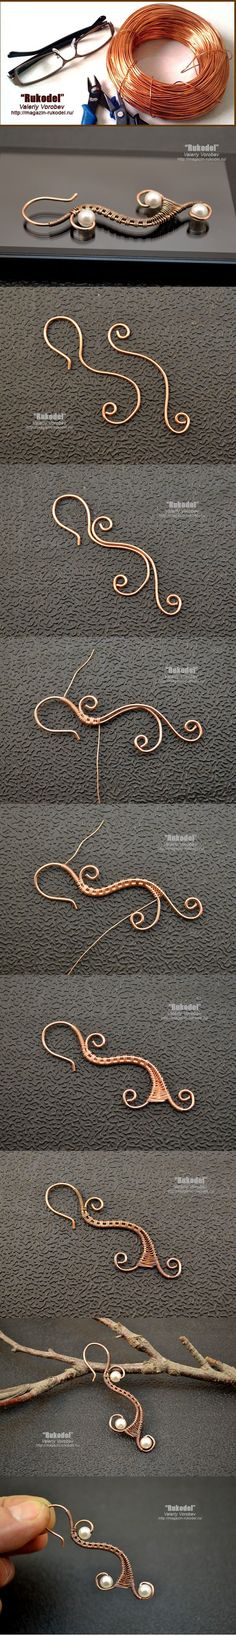 Wire Wrapped Earrings - http://magazin-rukodel.ru/?p=4388 I must remember tto…